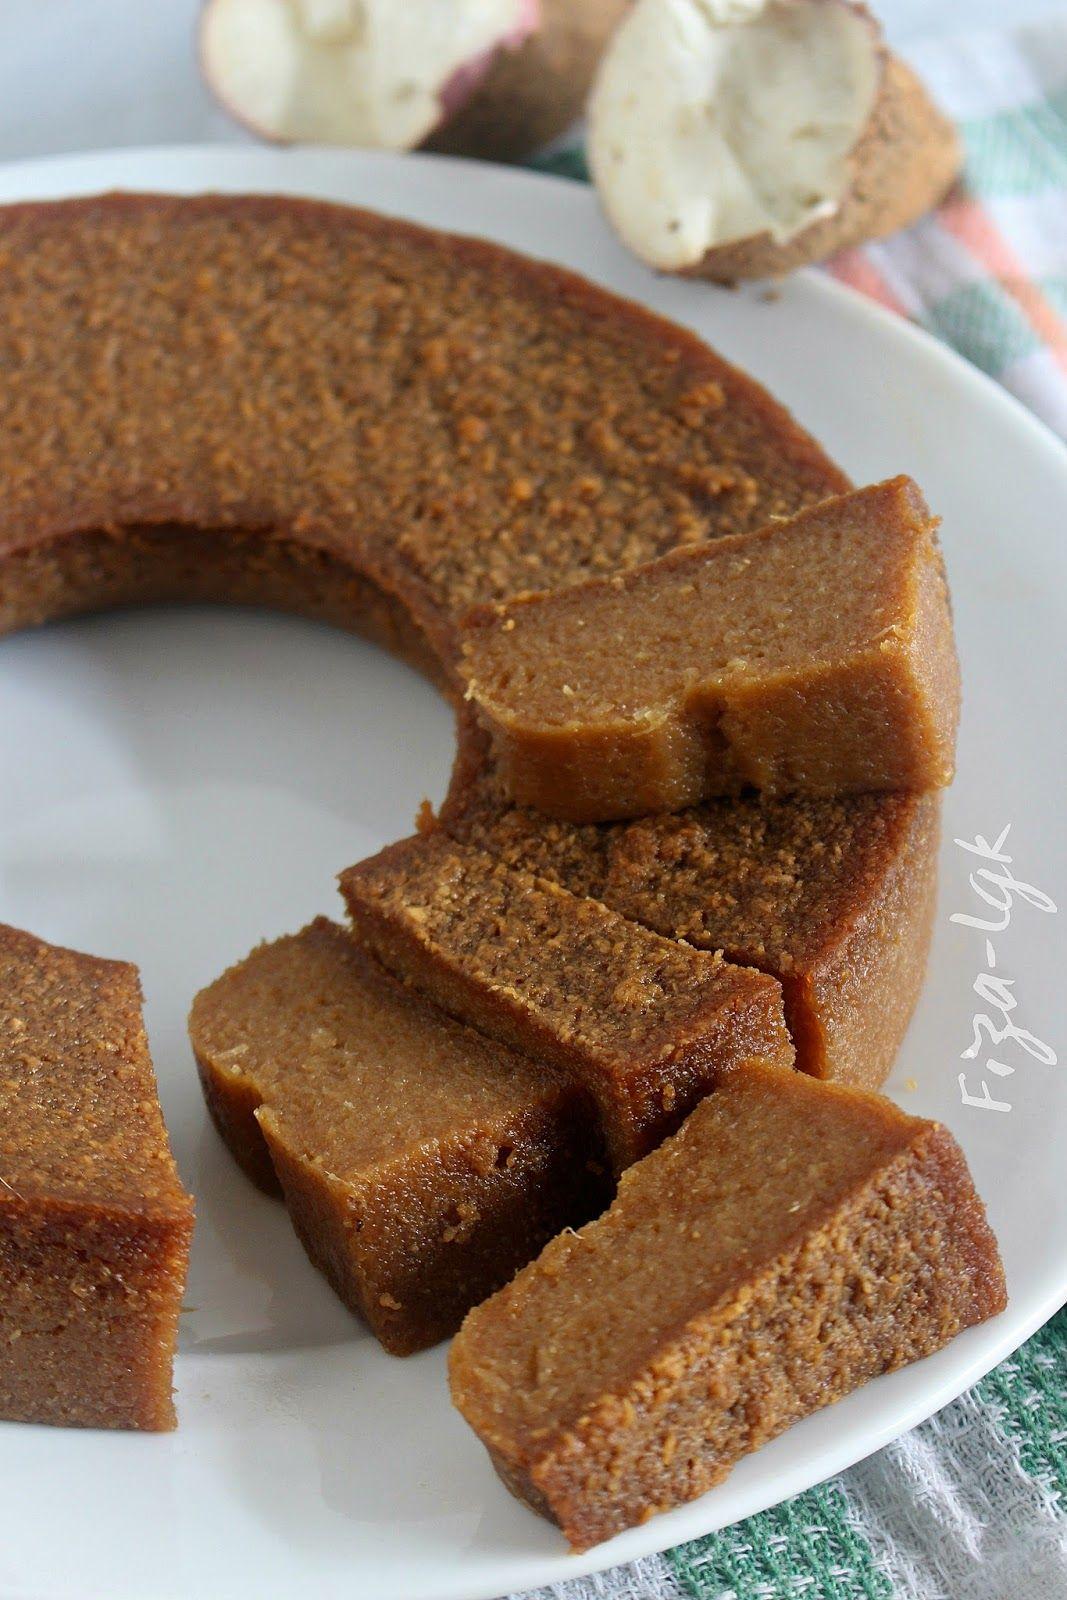 Bingka Ubi Kayu Gula Merah Fiza S Cooking Makanan Kue Lezat Makanan Manis